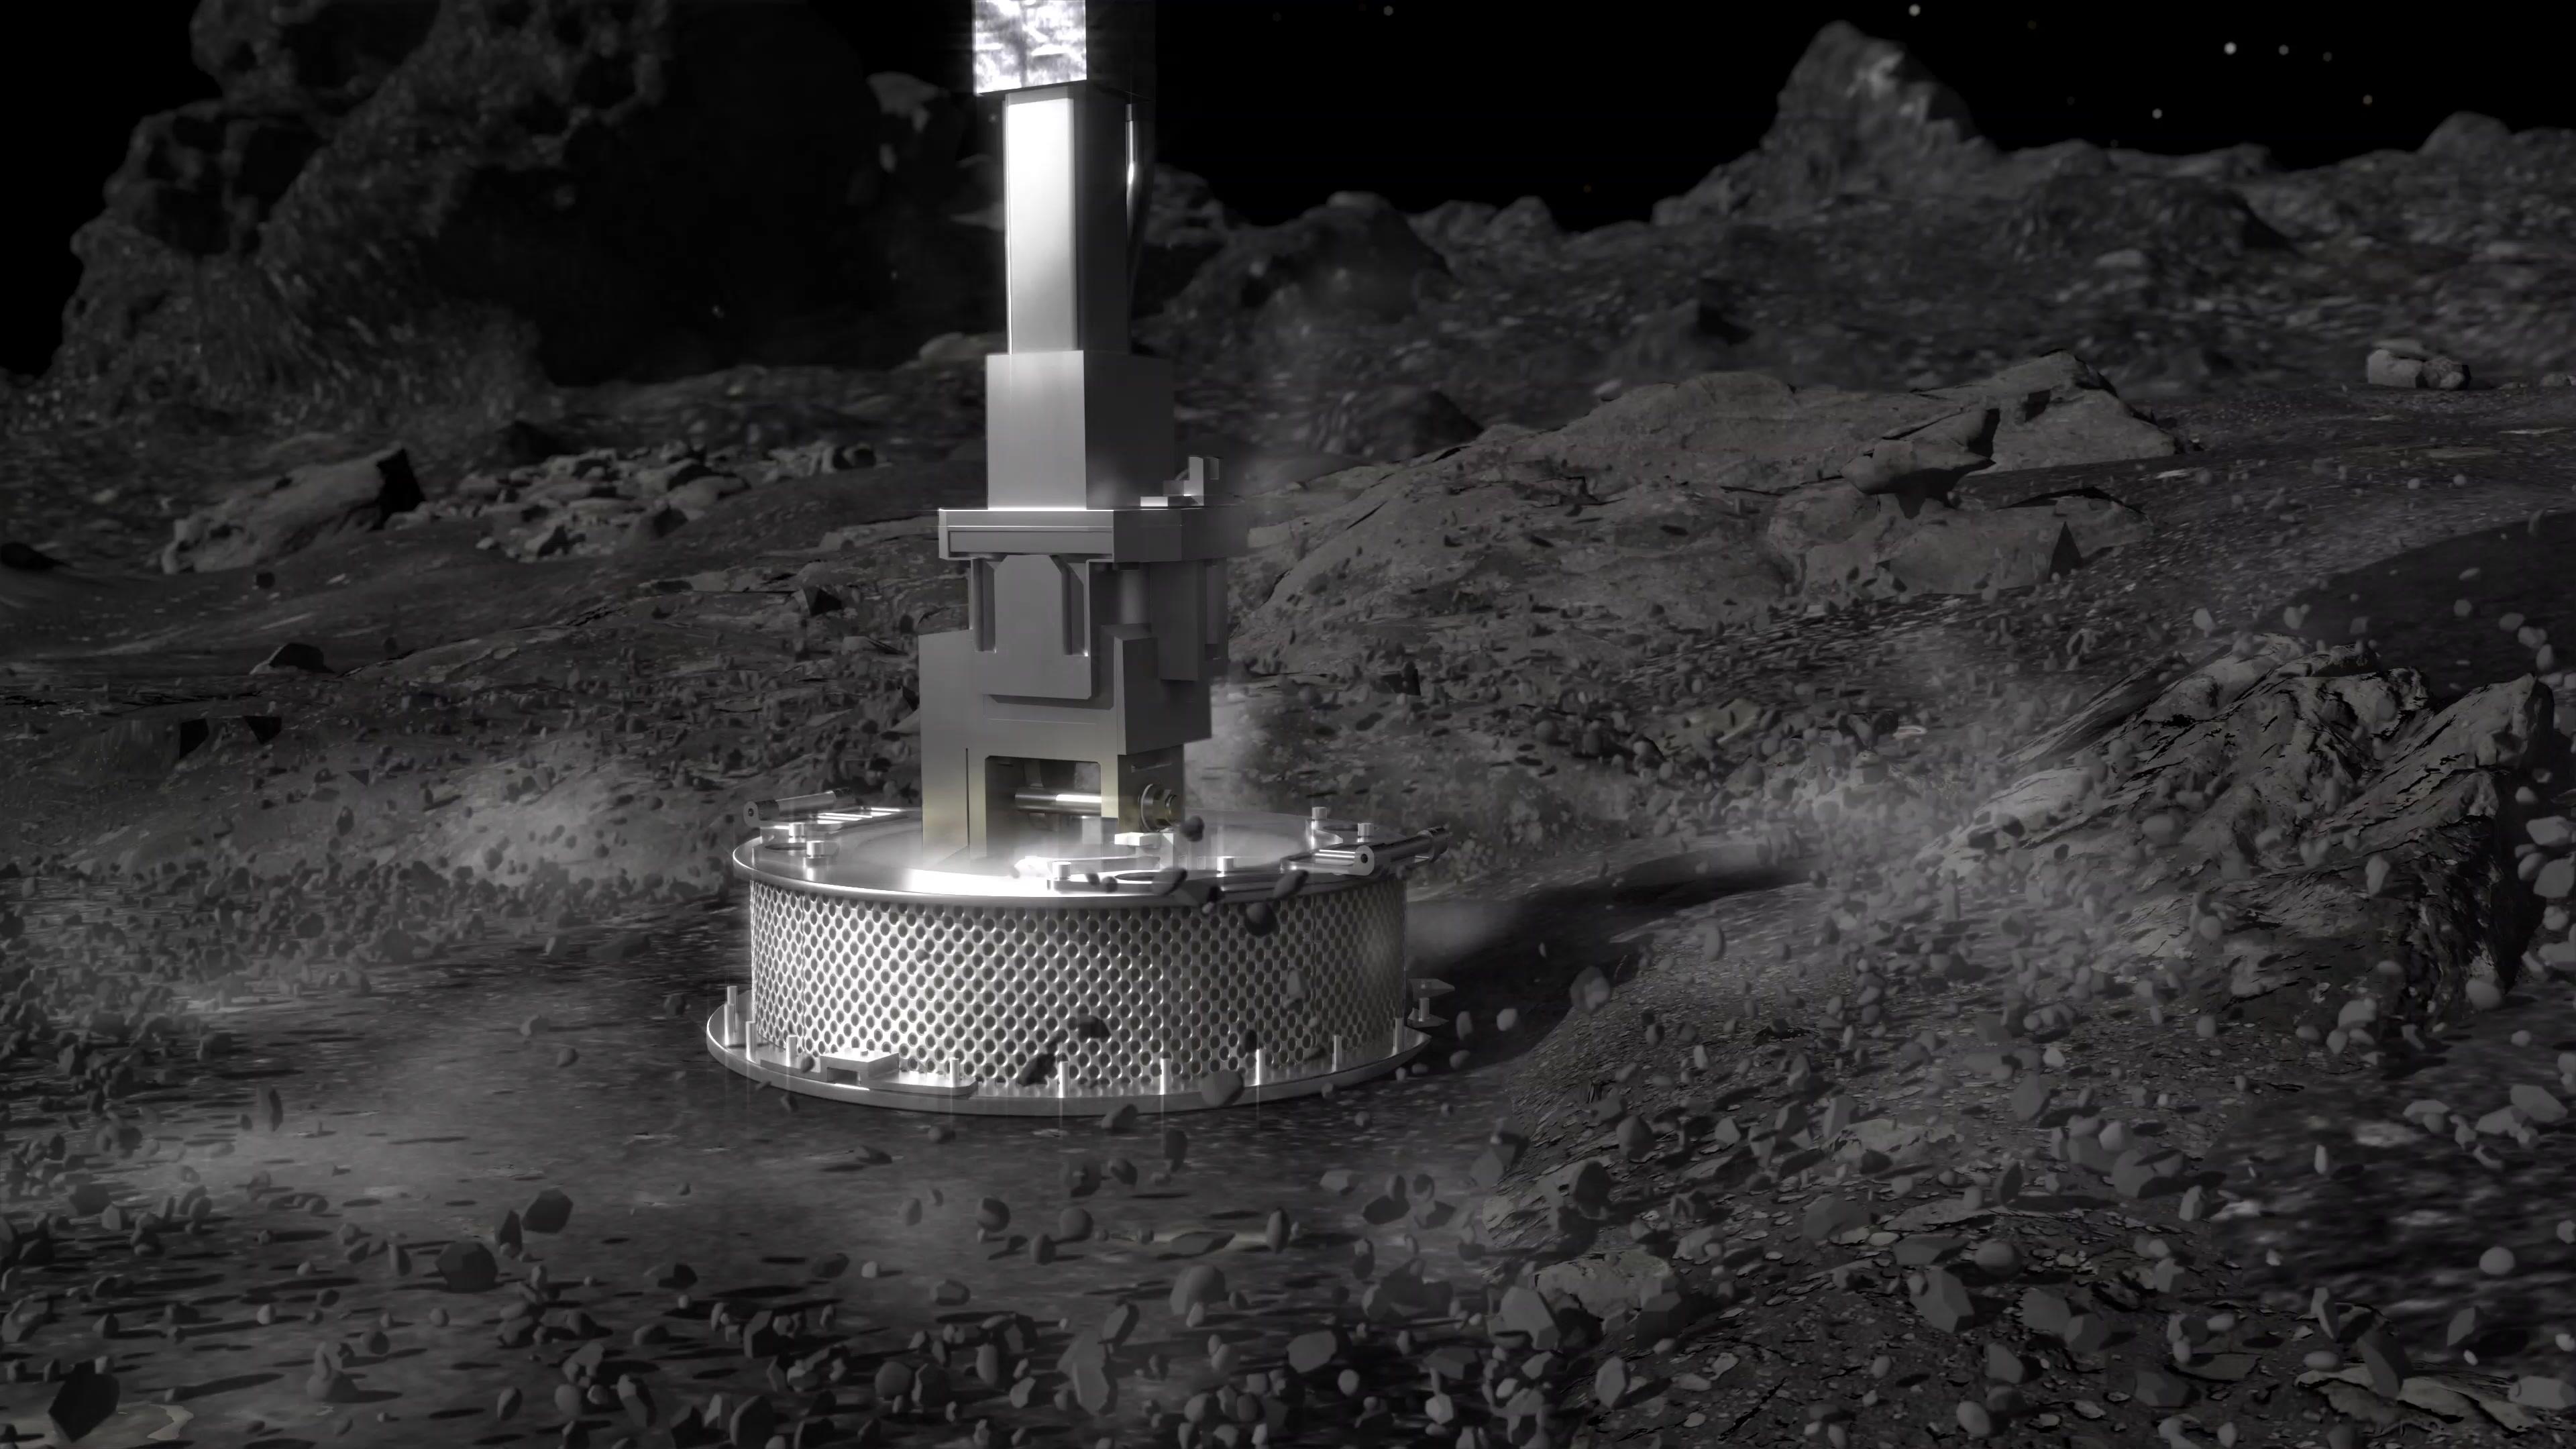 osiris rex asteroid bennu sample collection